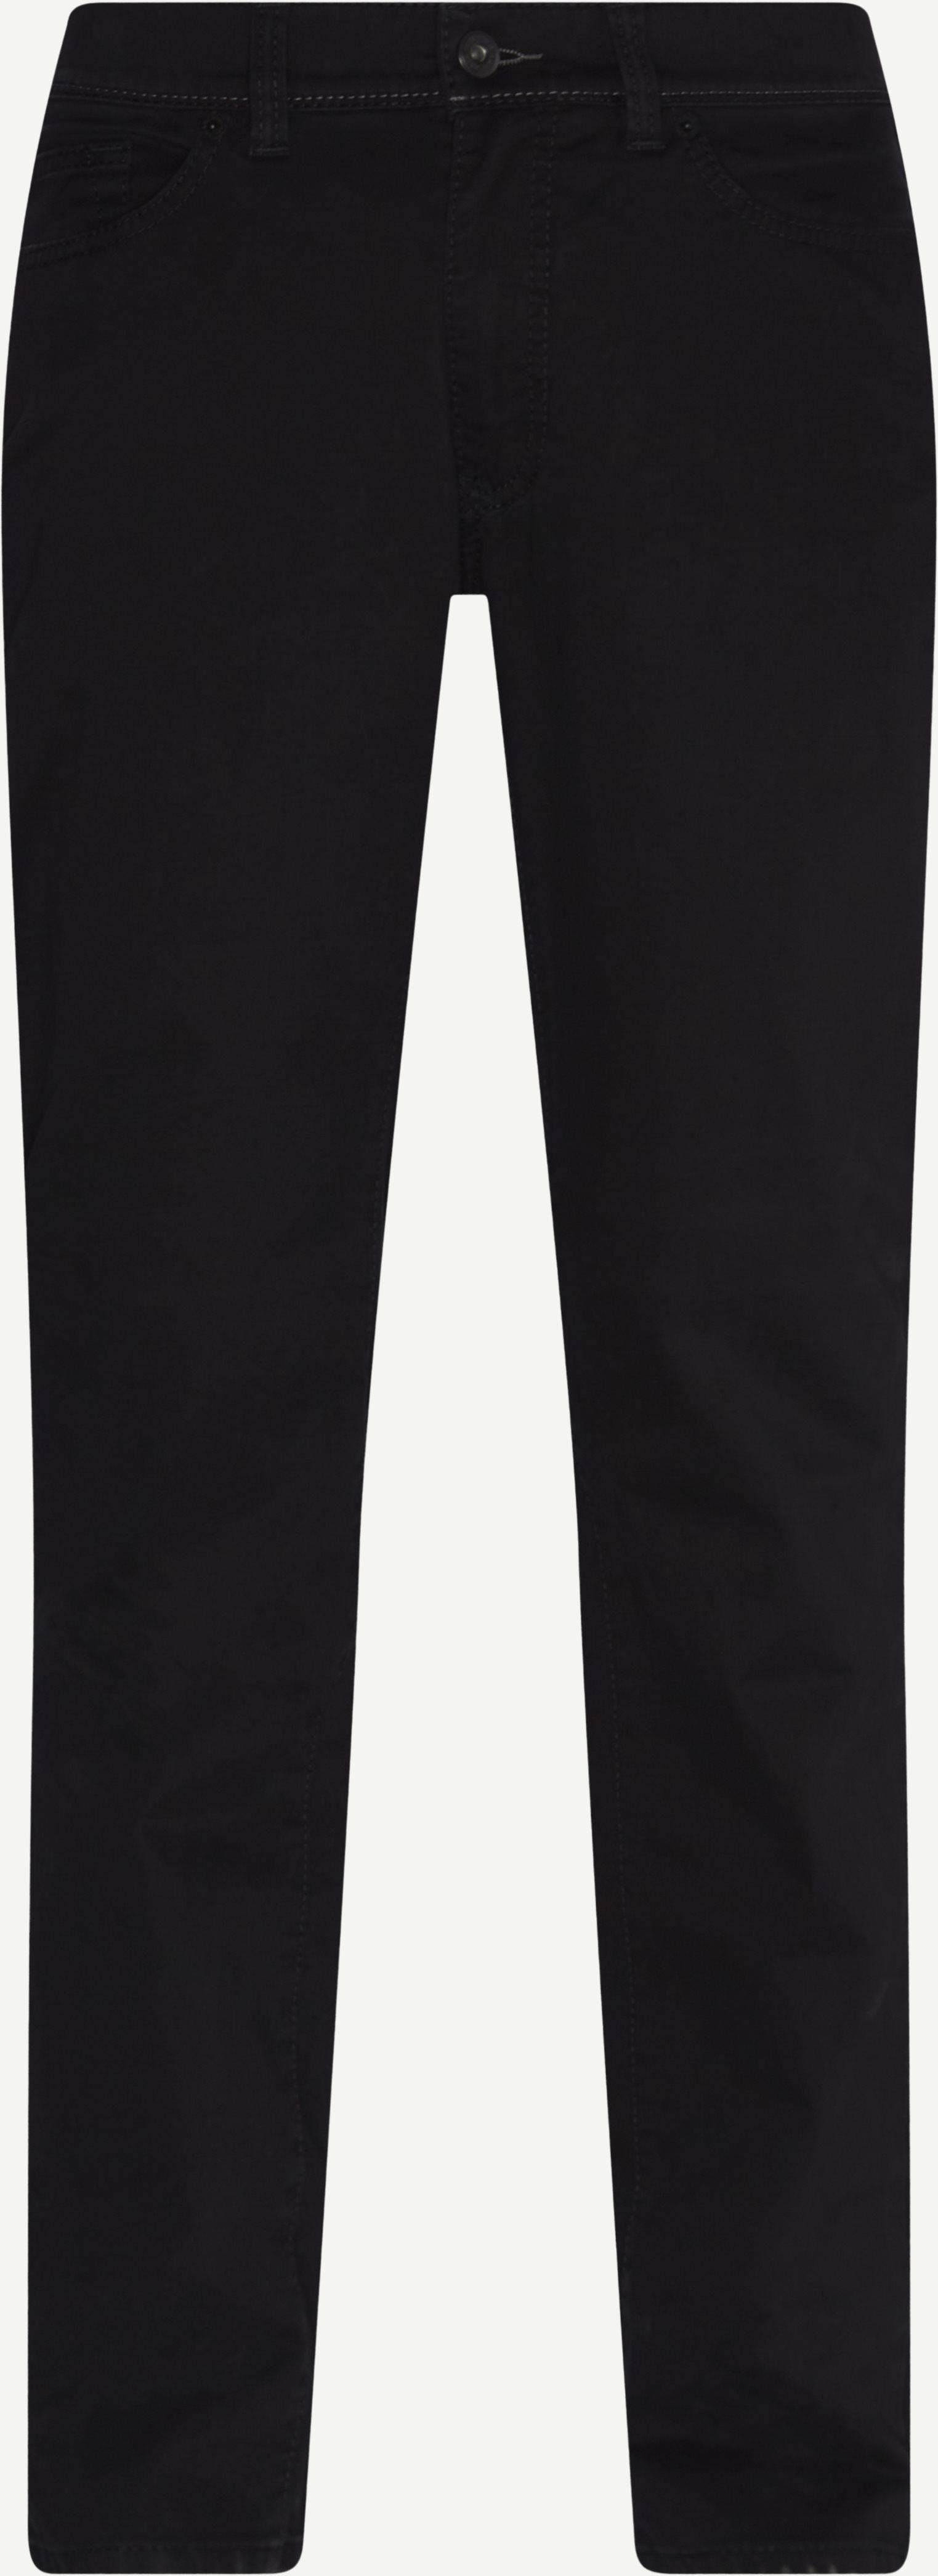 Cadiz Jeans - Jeans - Straight fit - Svart